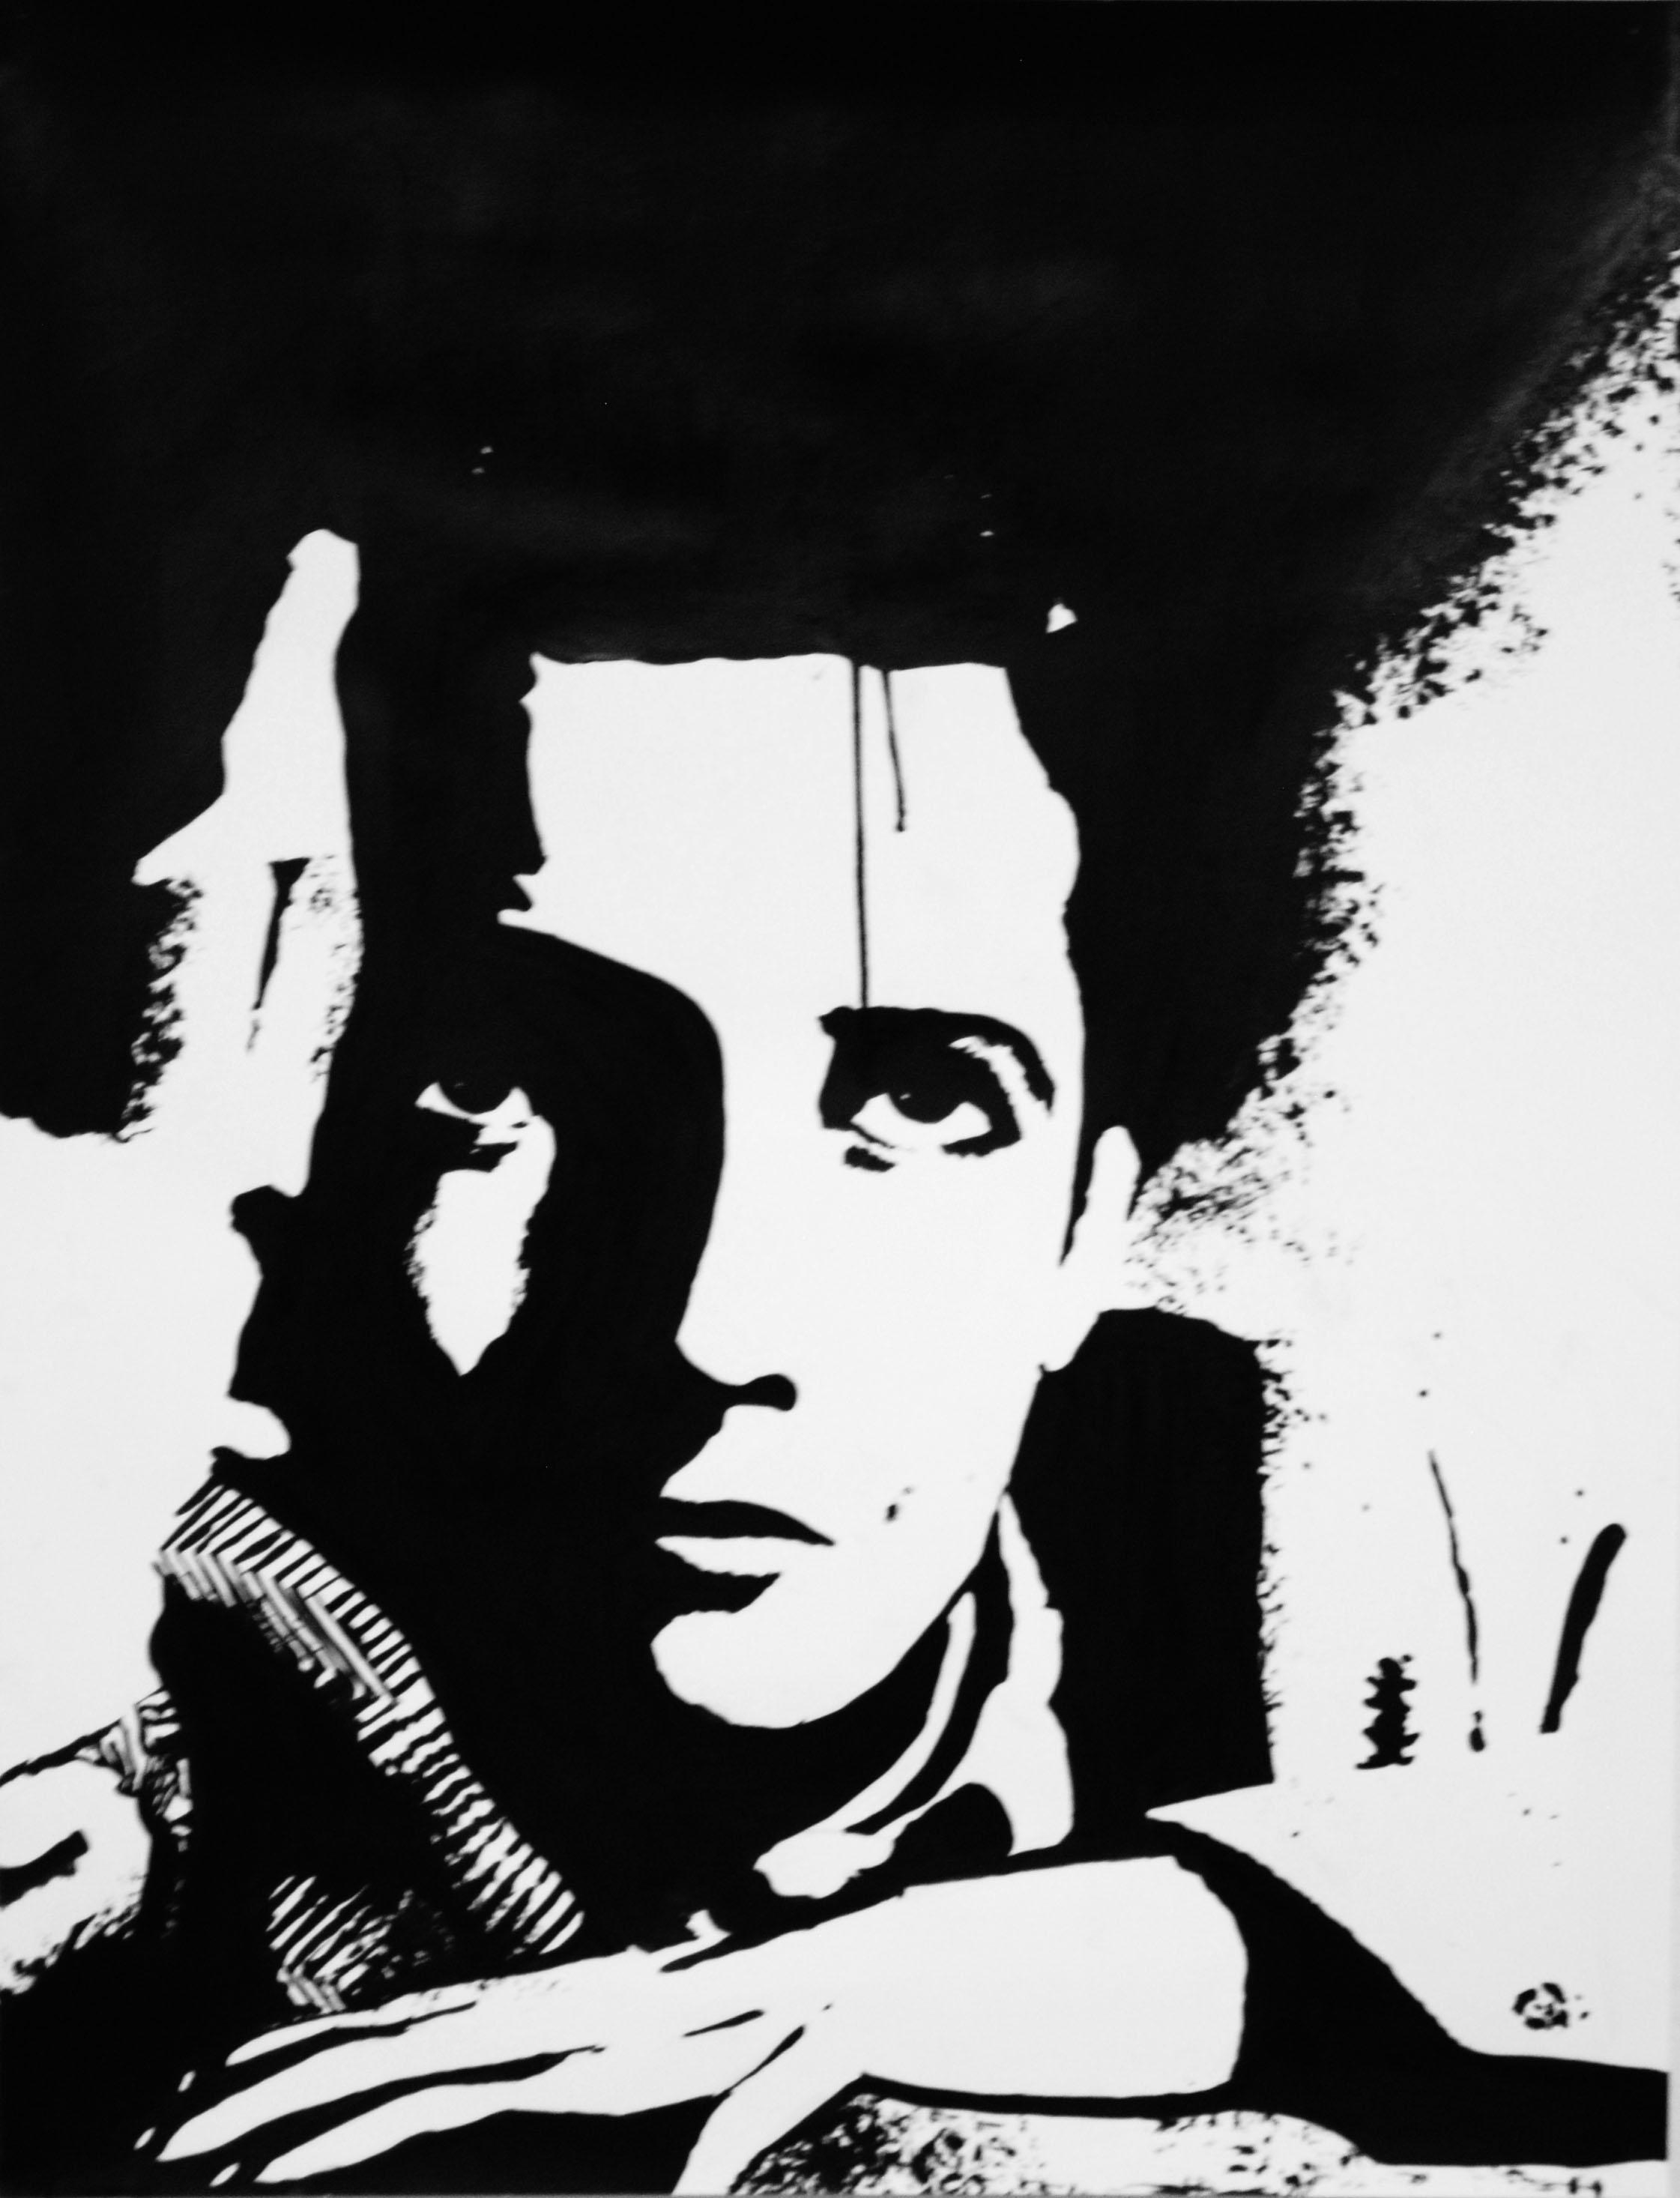 Brando (ink) - Sawyer Ames